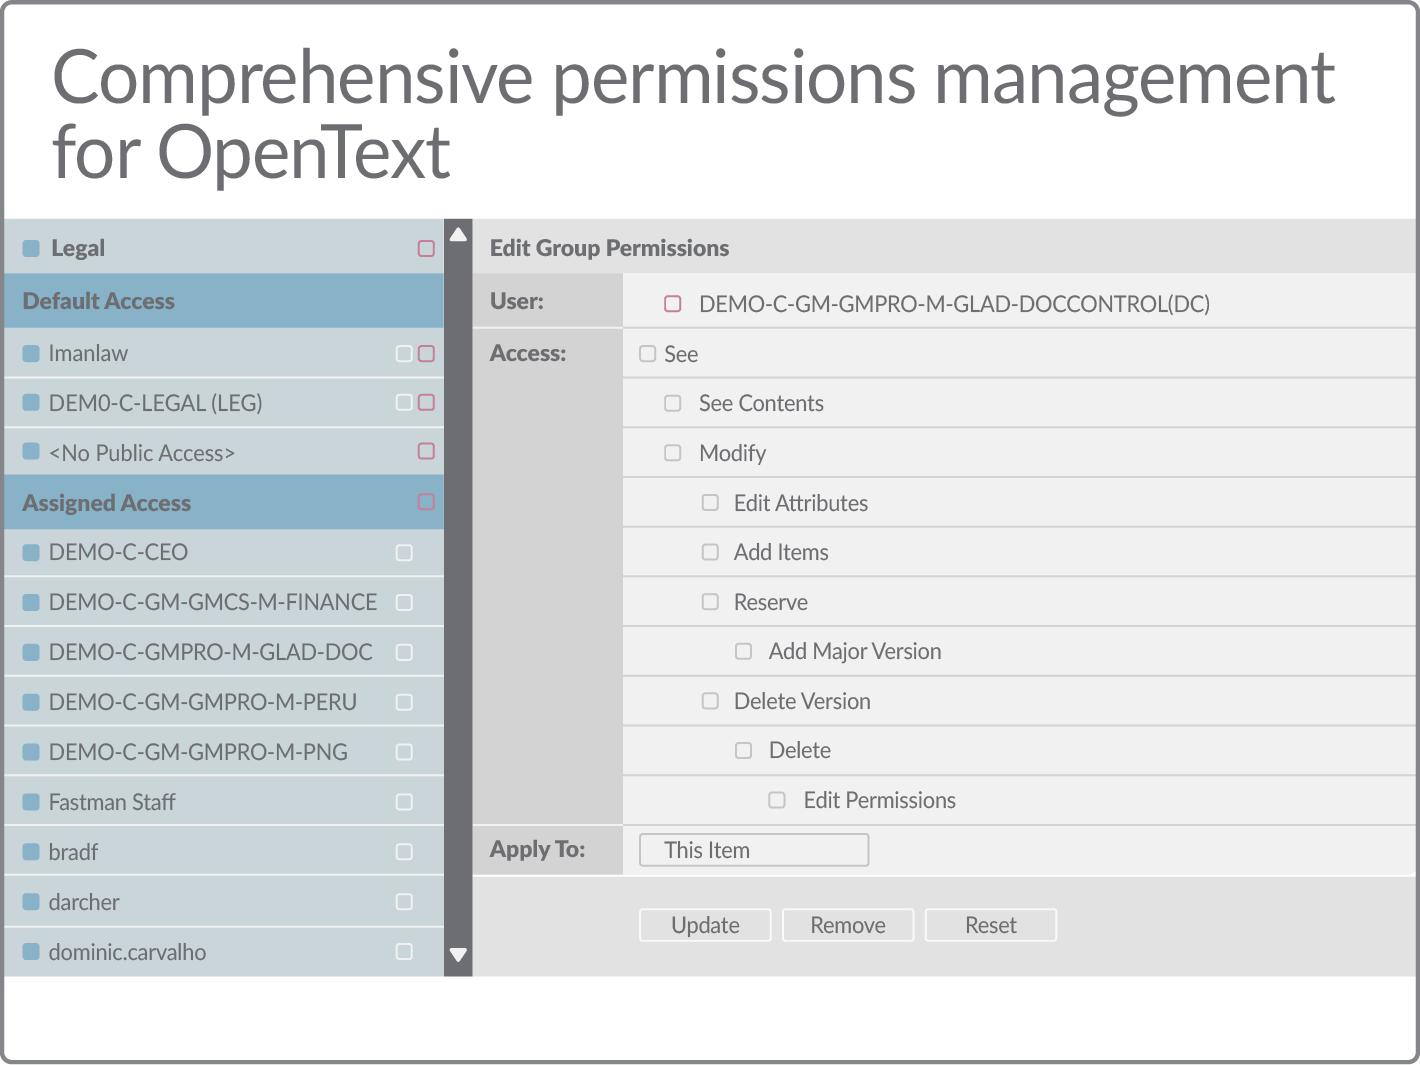 Comprehensive permissions management for OpenText